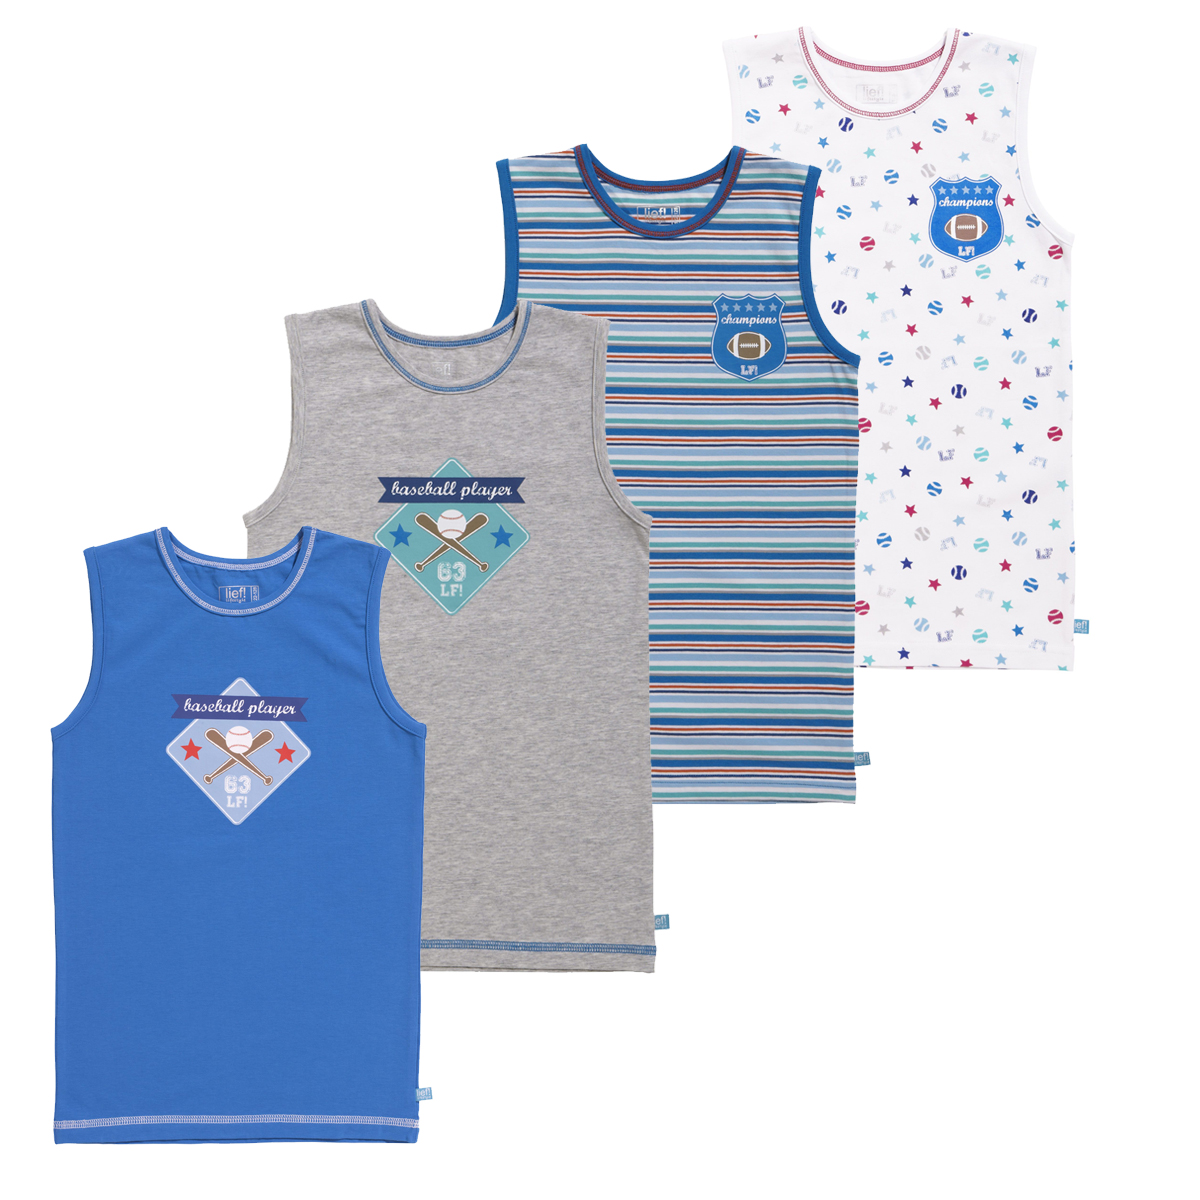 Lief Boys Verrassingspakket hemdjes 1-pack